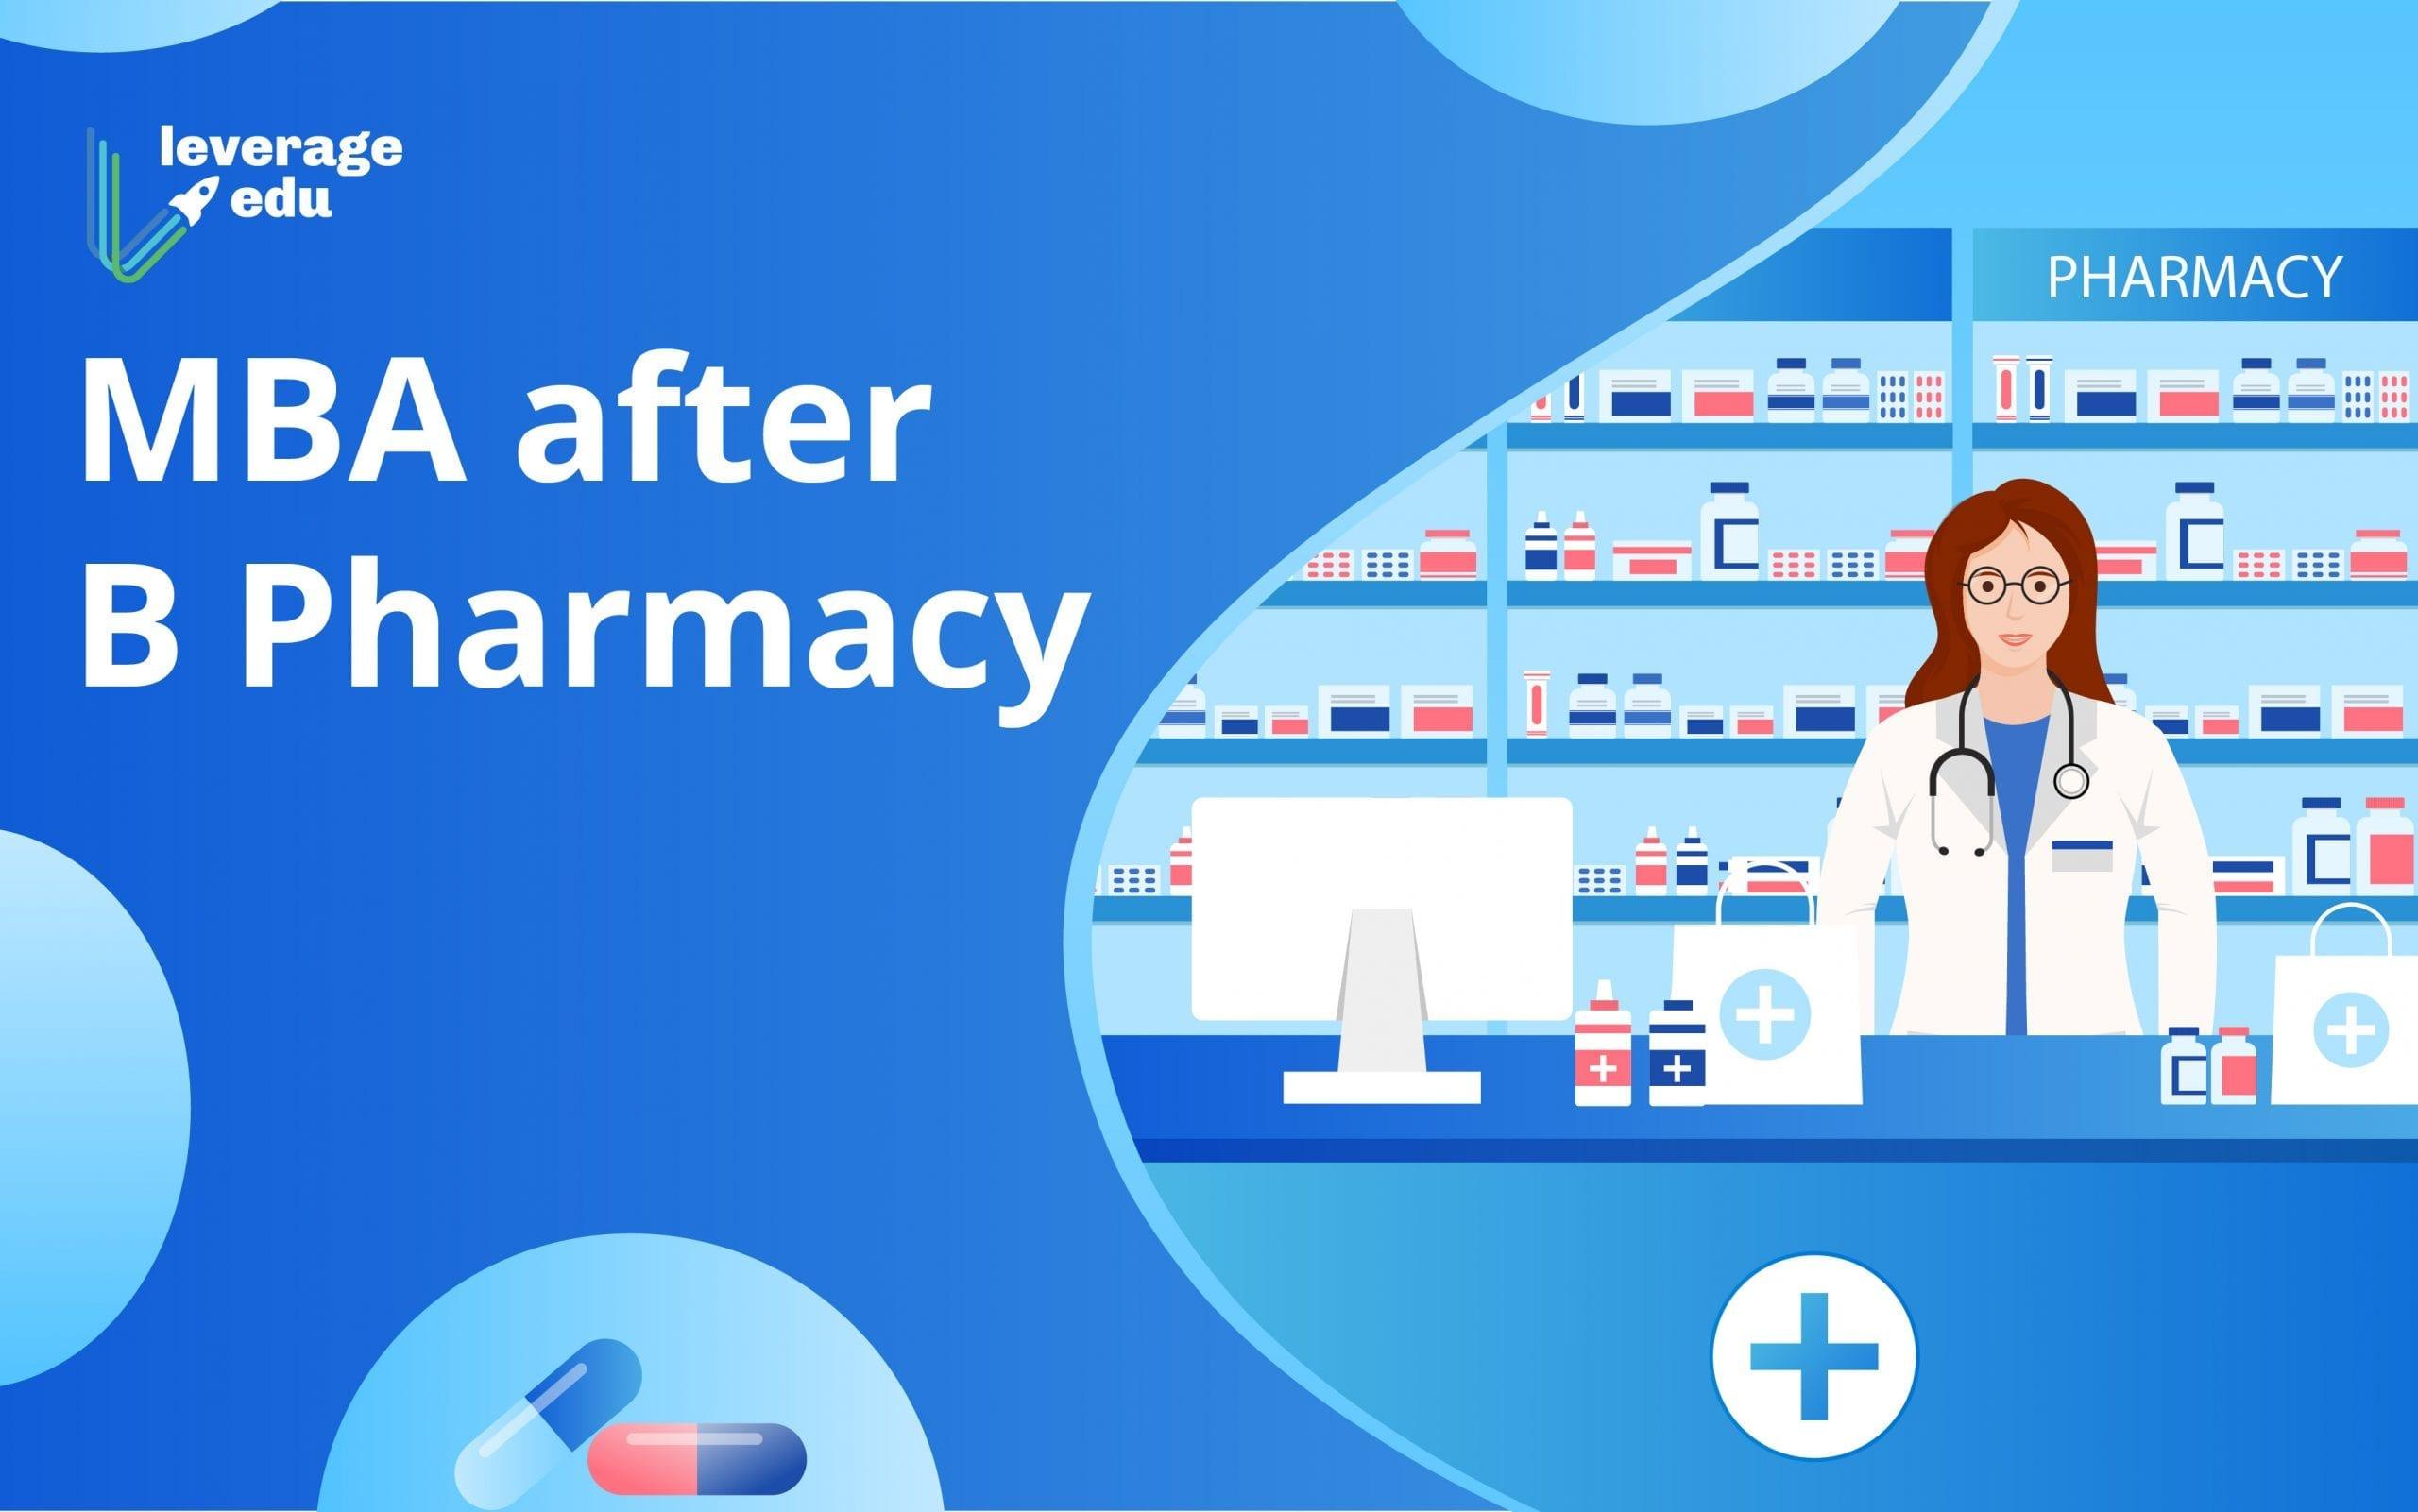 MBA after B Pharmacy: Benefits, Universities & Salary - Leverage Edu